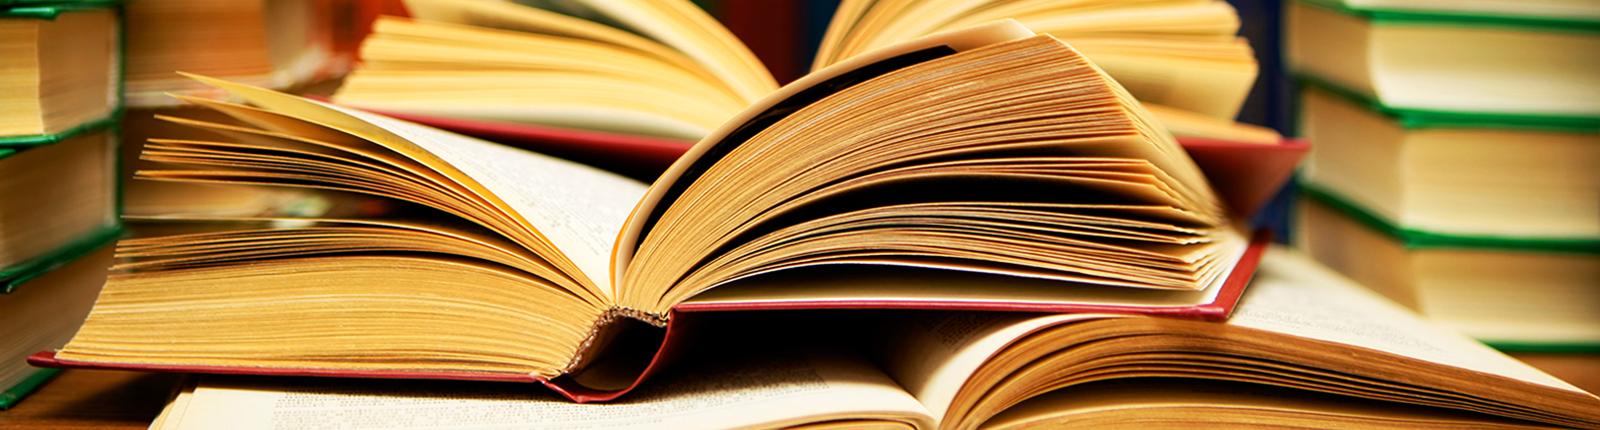 The-Scholars-Choice-Books.jpg